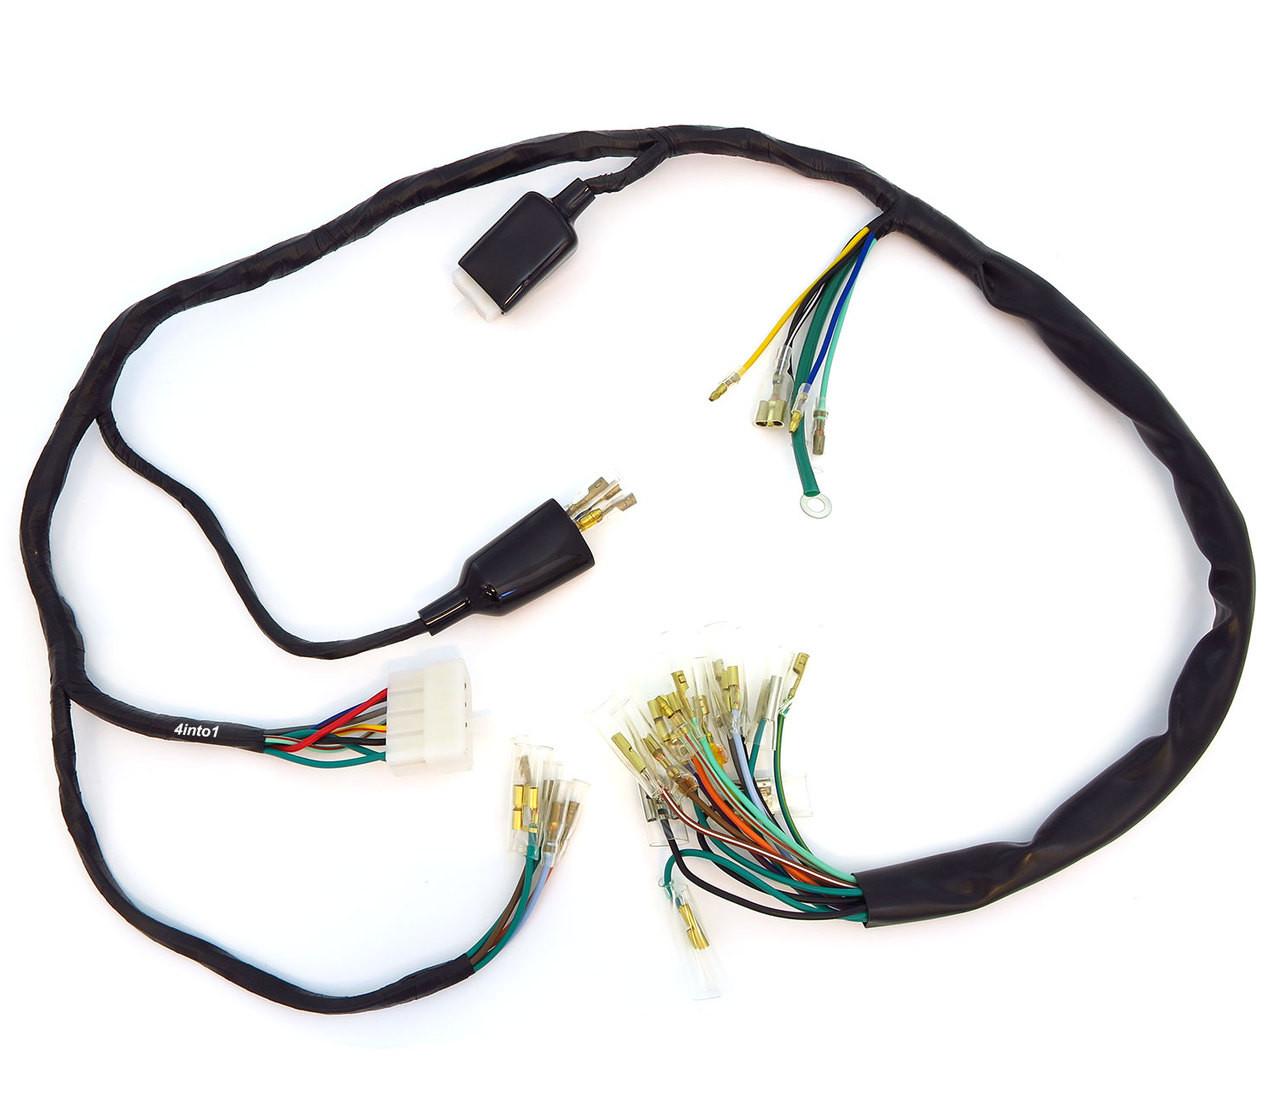 small resolution of main wiring harness 32100 323 040 honda cb500k 1972 1973 honda ignition coil honda wiring harness